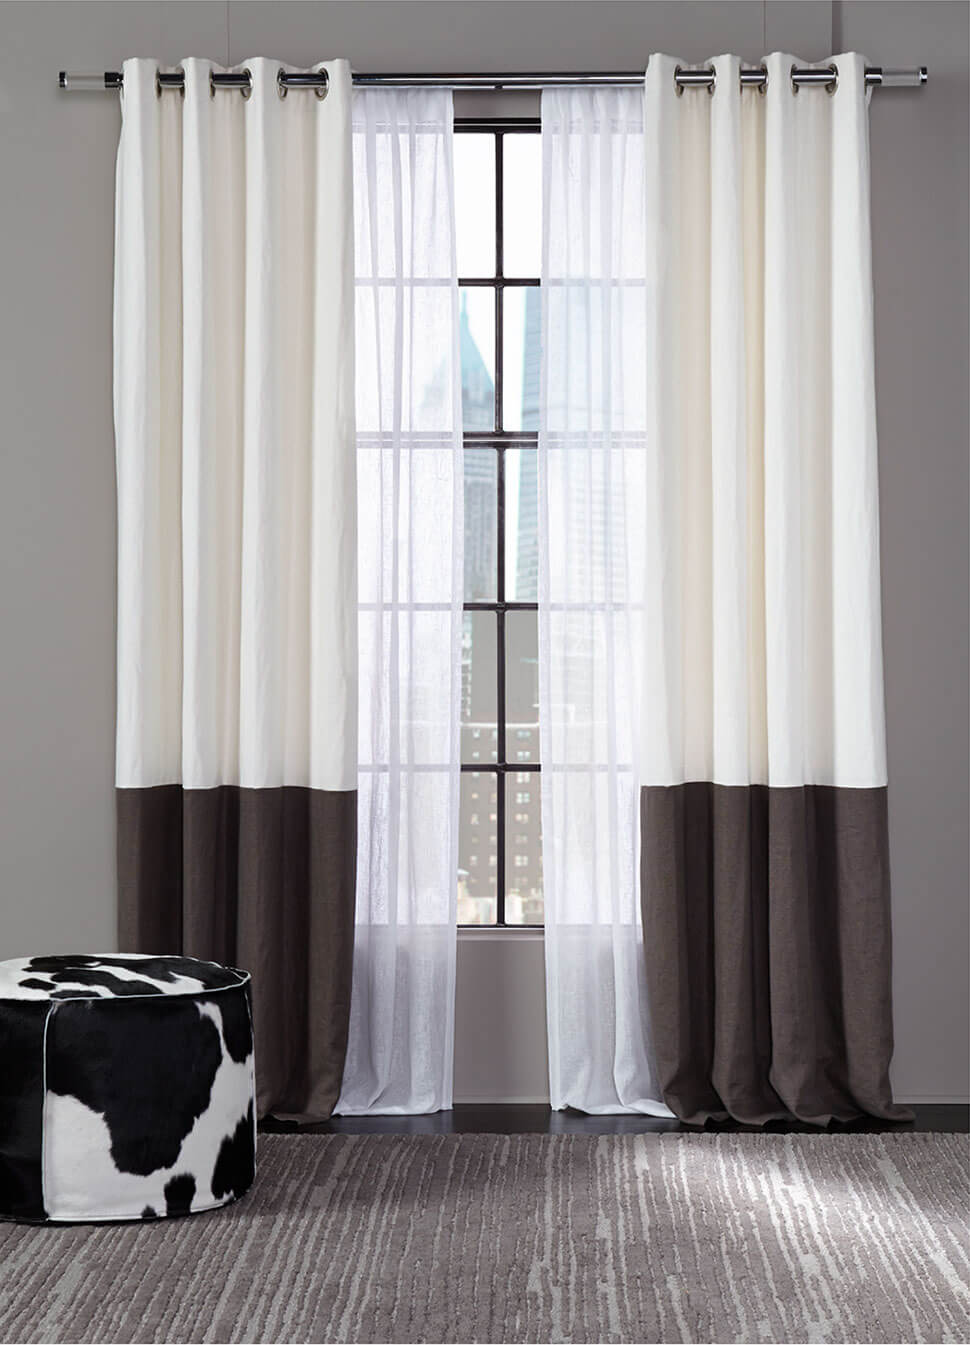 Belgian Linen drapery collection: Linens